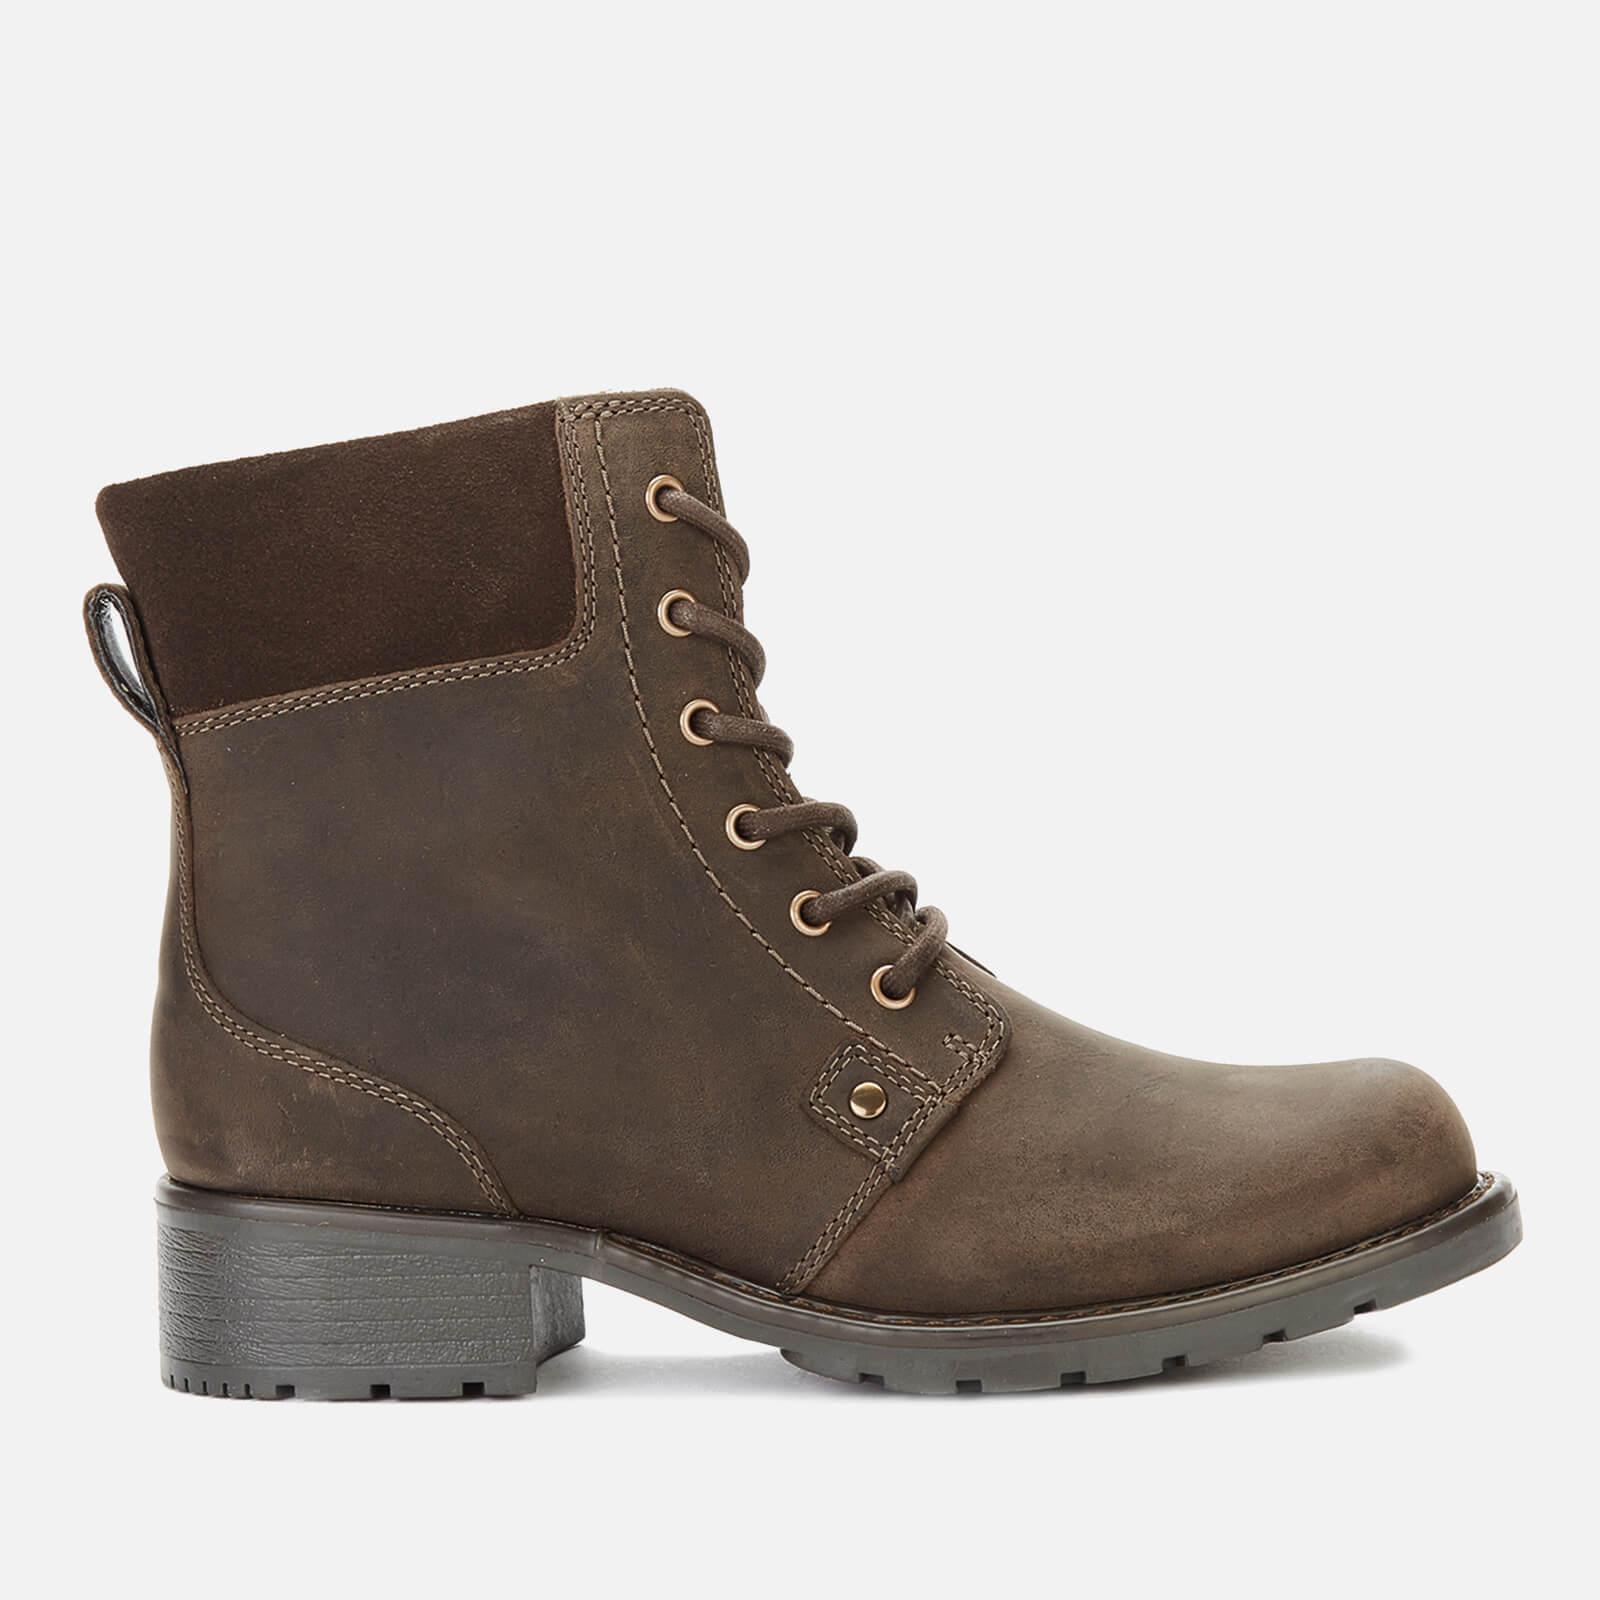 Clarks Women's Orinoco Spice Nubuck Lace Up Boots - Dark Brown - UK 5